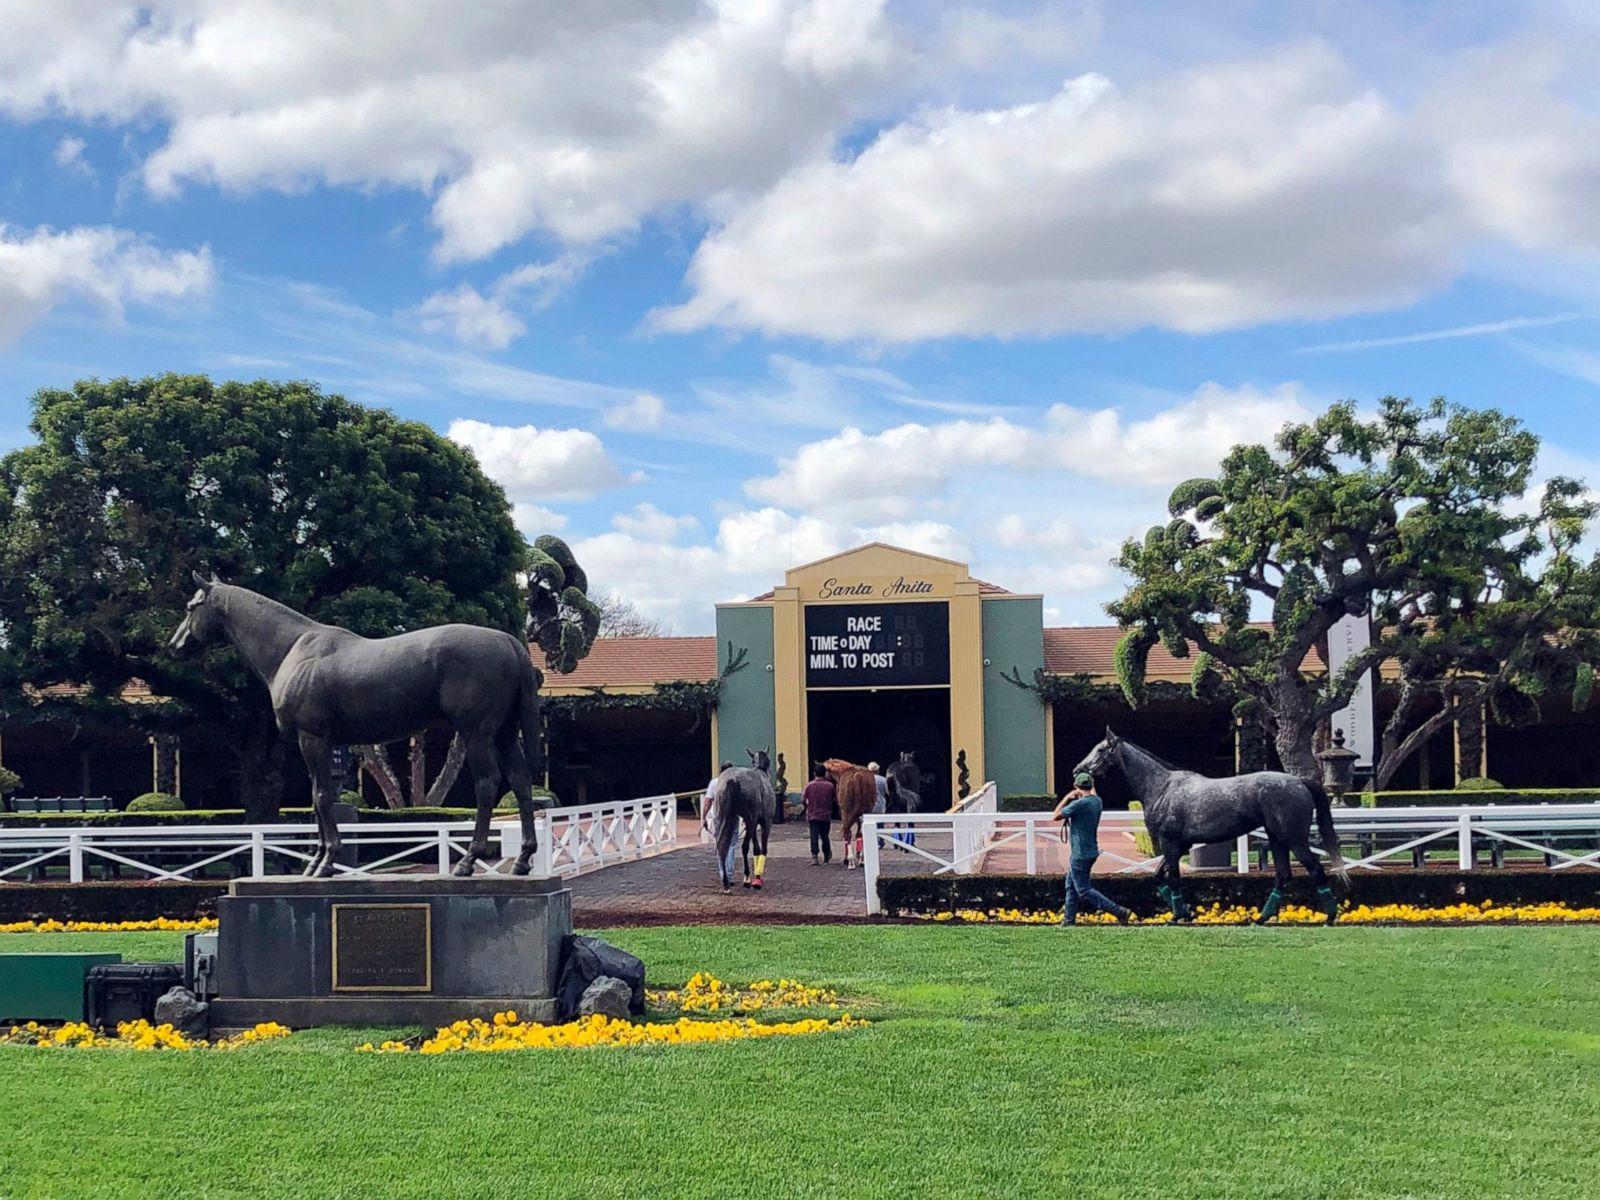 Santa Anita racetrack reopening after 22 horses died - ABC News